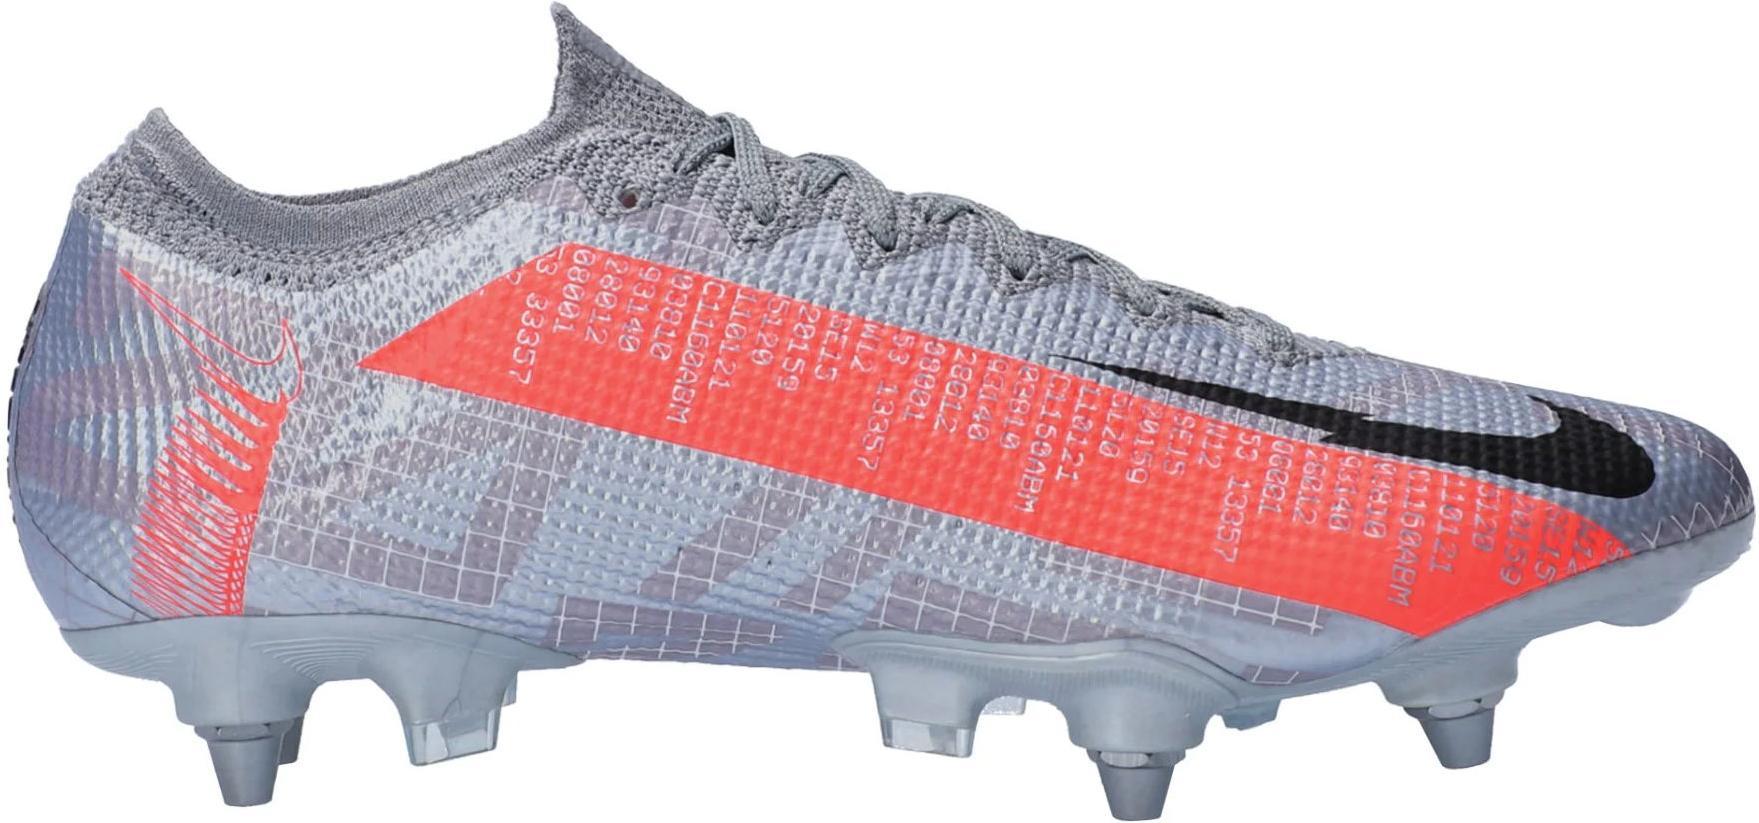 Kopačky Nike VAPOR 13 ELITE SG-PRO